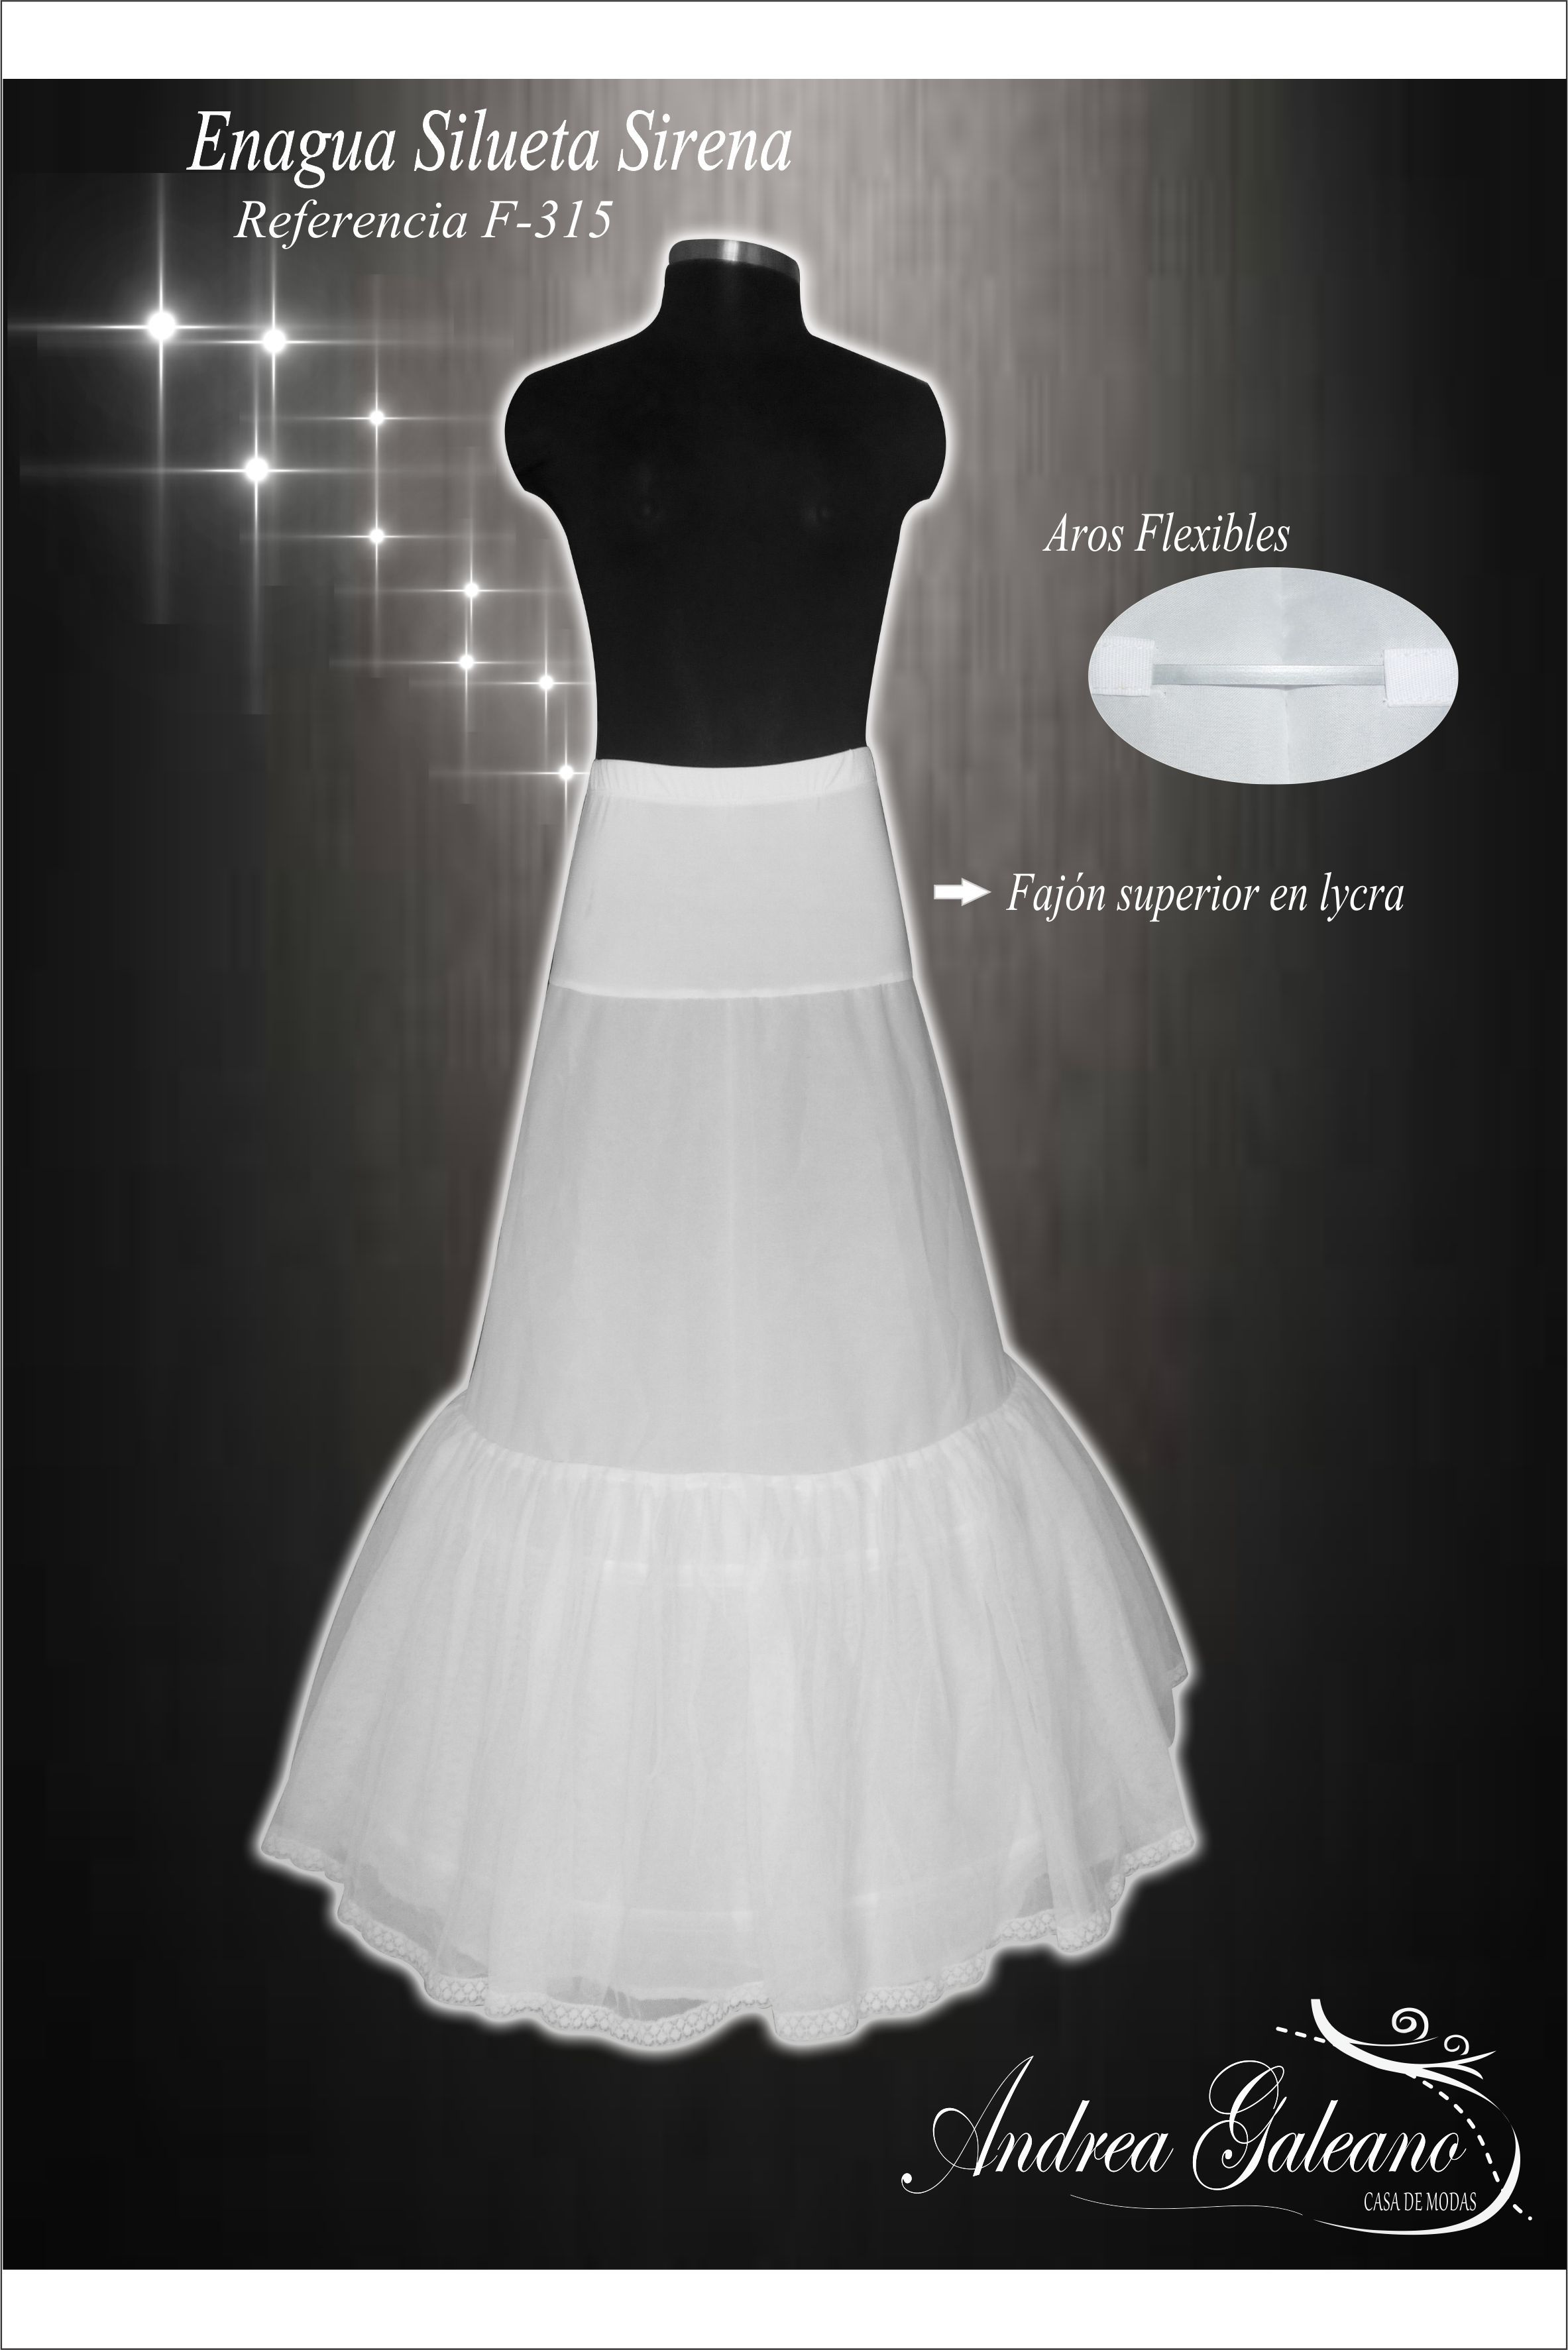 Petticoats Jupon Mariage Hot Sale White Tulle Tulle Dress Long Underskirt Cheap Petticoat Stock Enaguas Para El Vestido De Boda Wedding Accessories